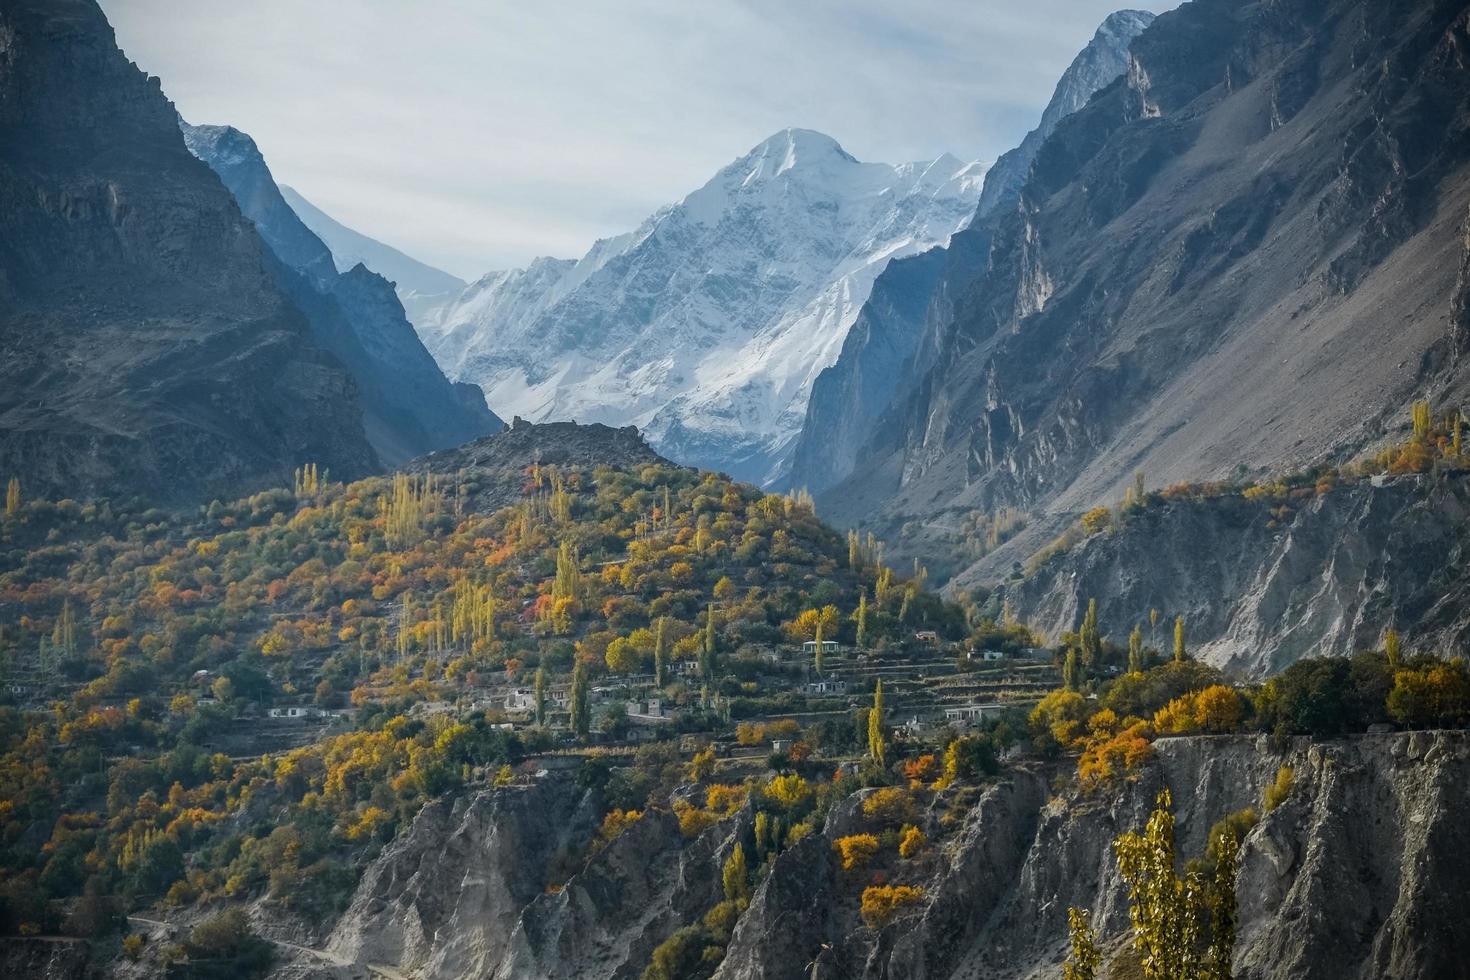 Cordillera de Karakoram en el valle de Nagar, Pakistán foto